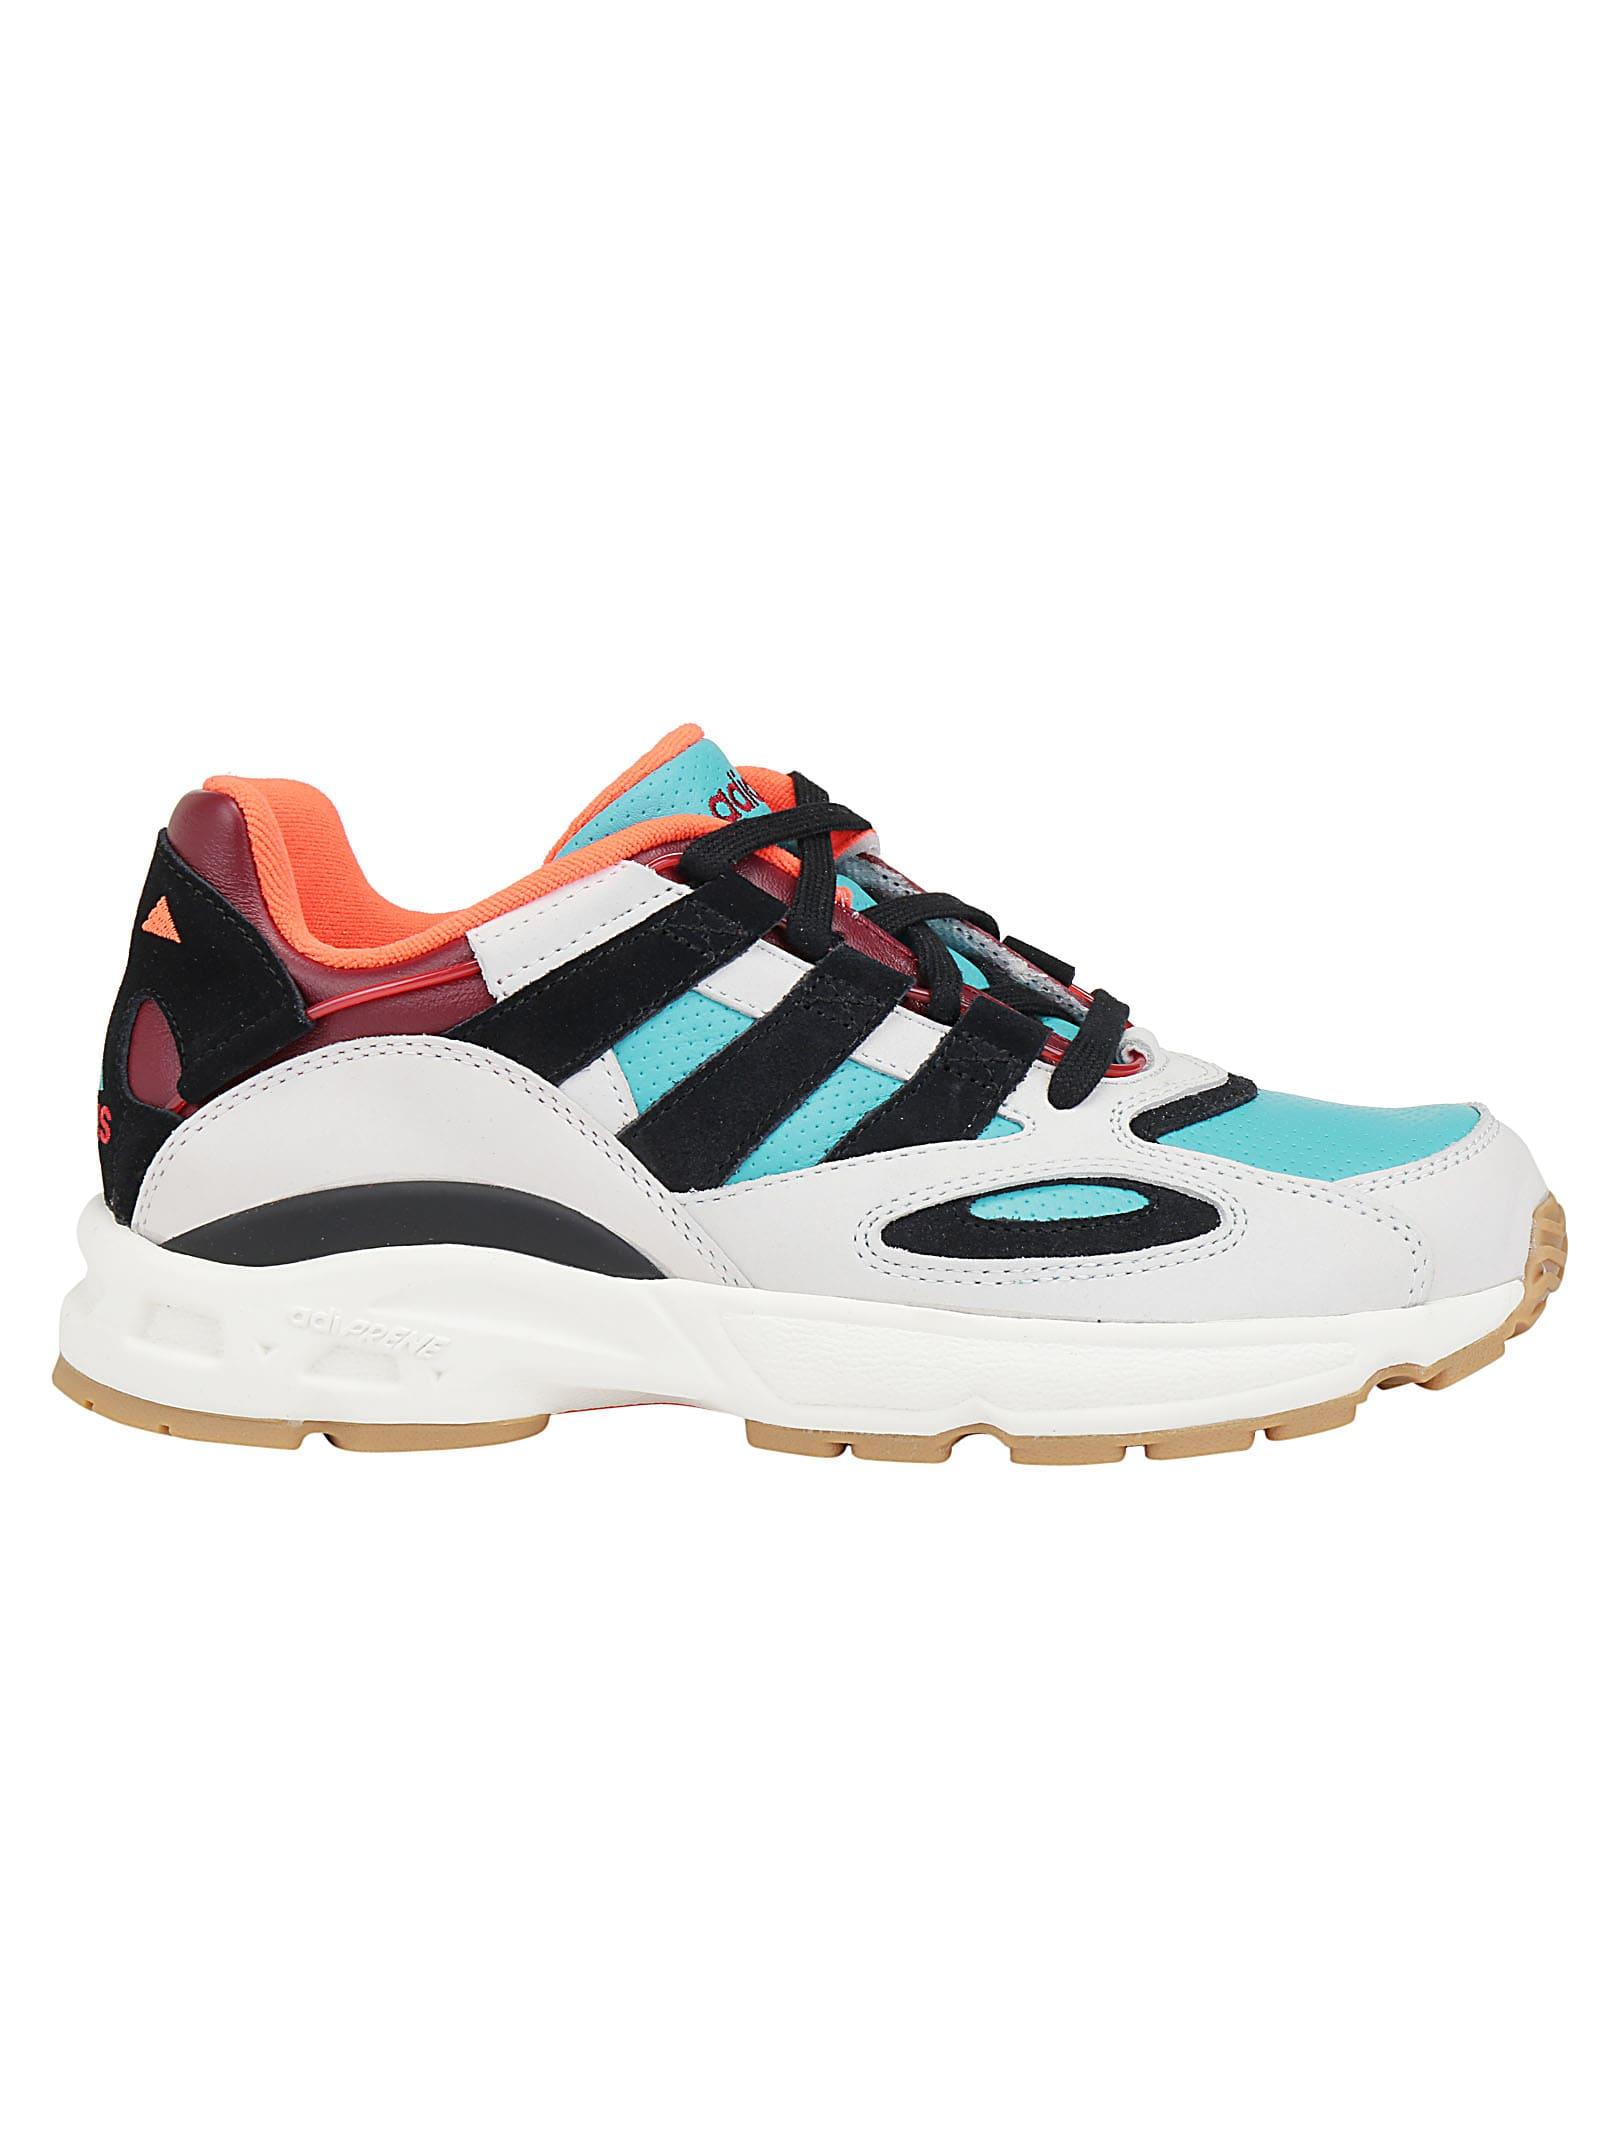 Adidas Originals Sneakers ADIADS LXCON 94 SNEAKERS